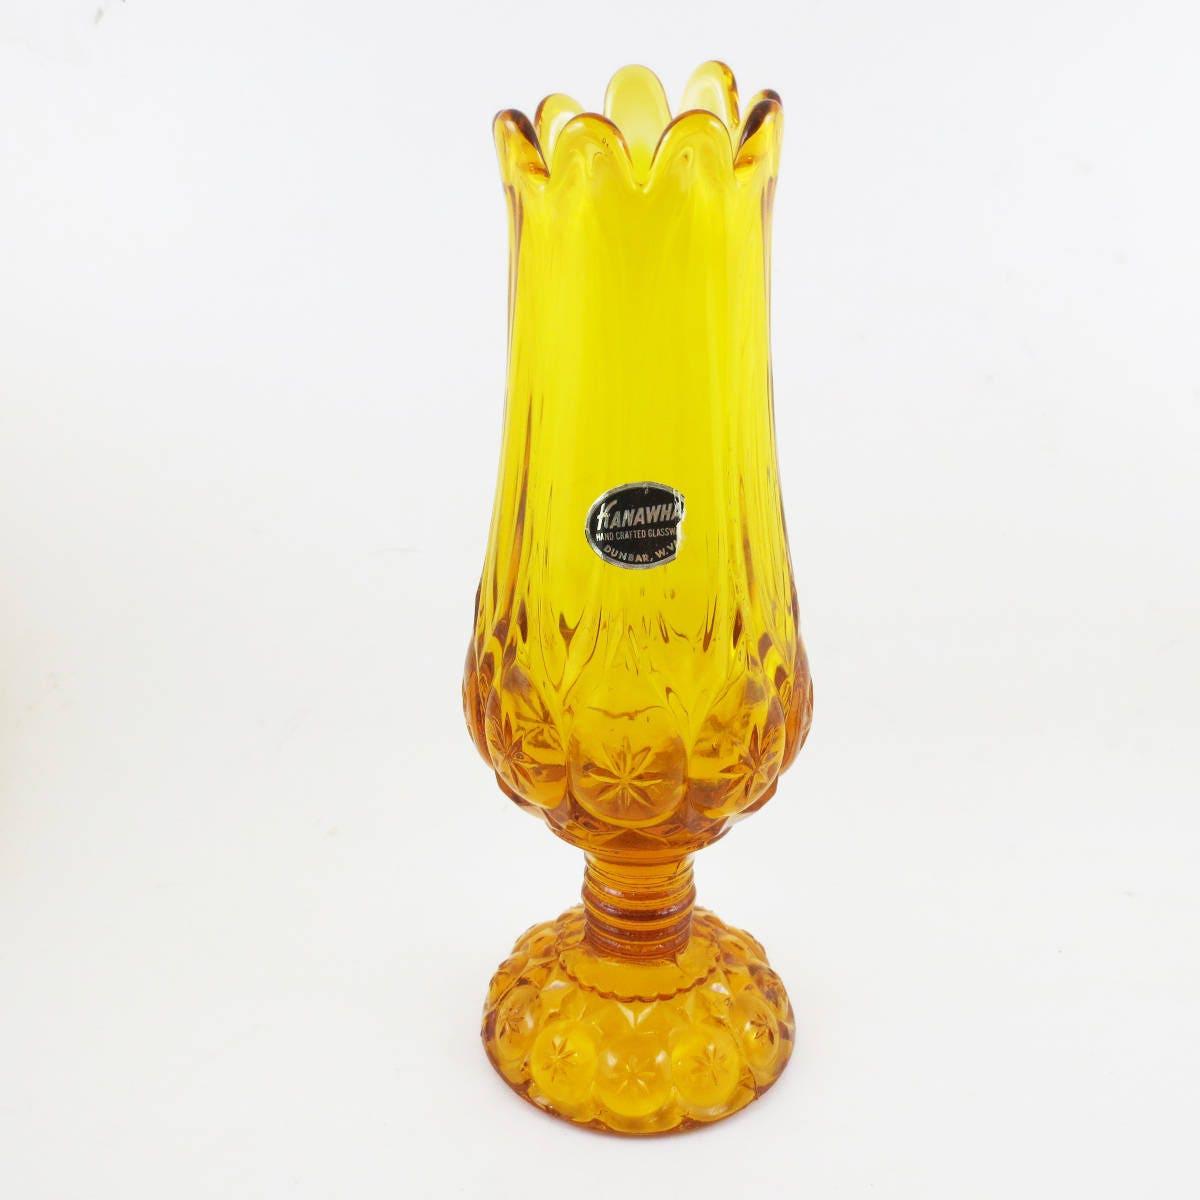 Mid century art glass vase kahawha glass west virginia amber description this vintage glass vase reviewsmspy